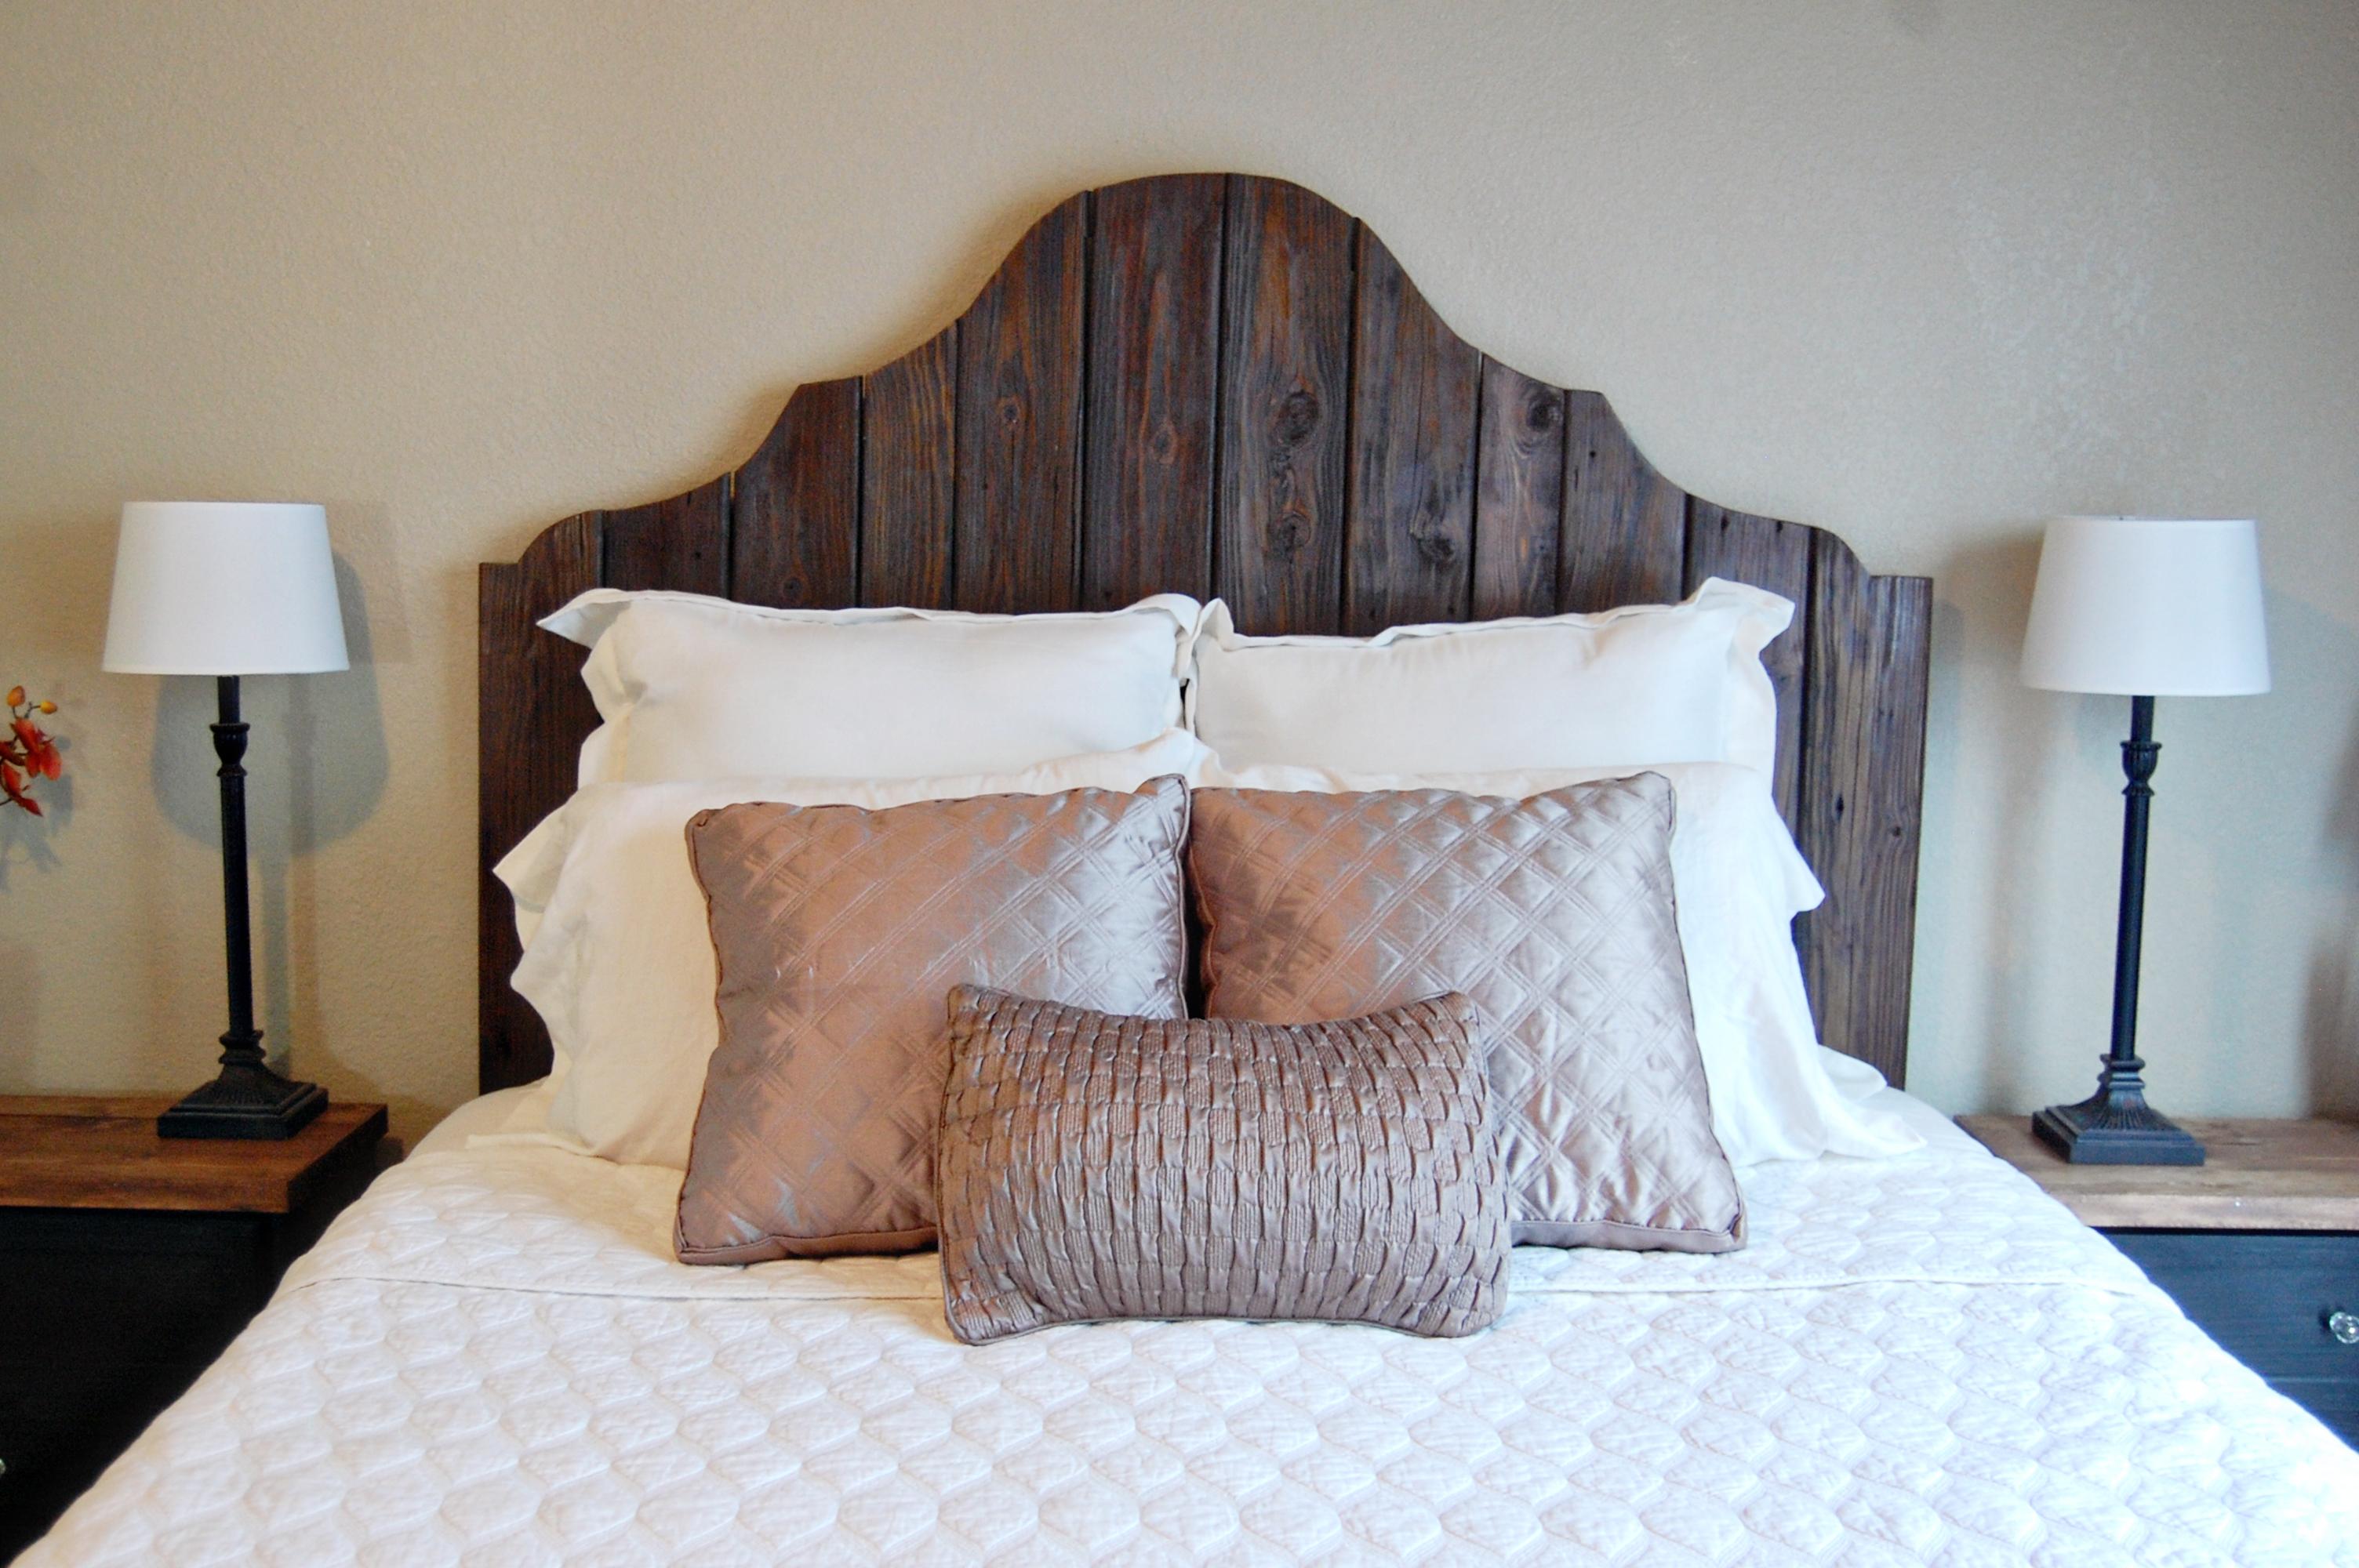 Wood Bed: Build It